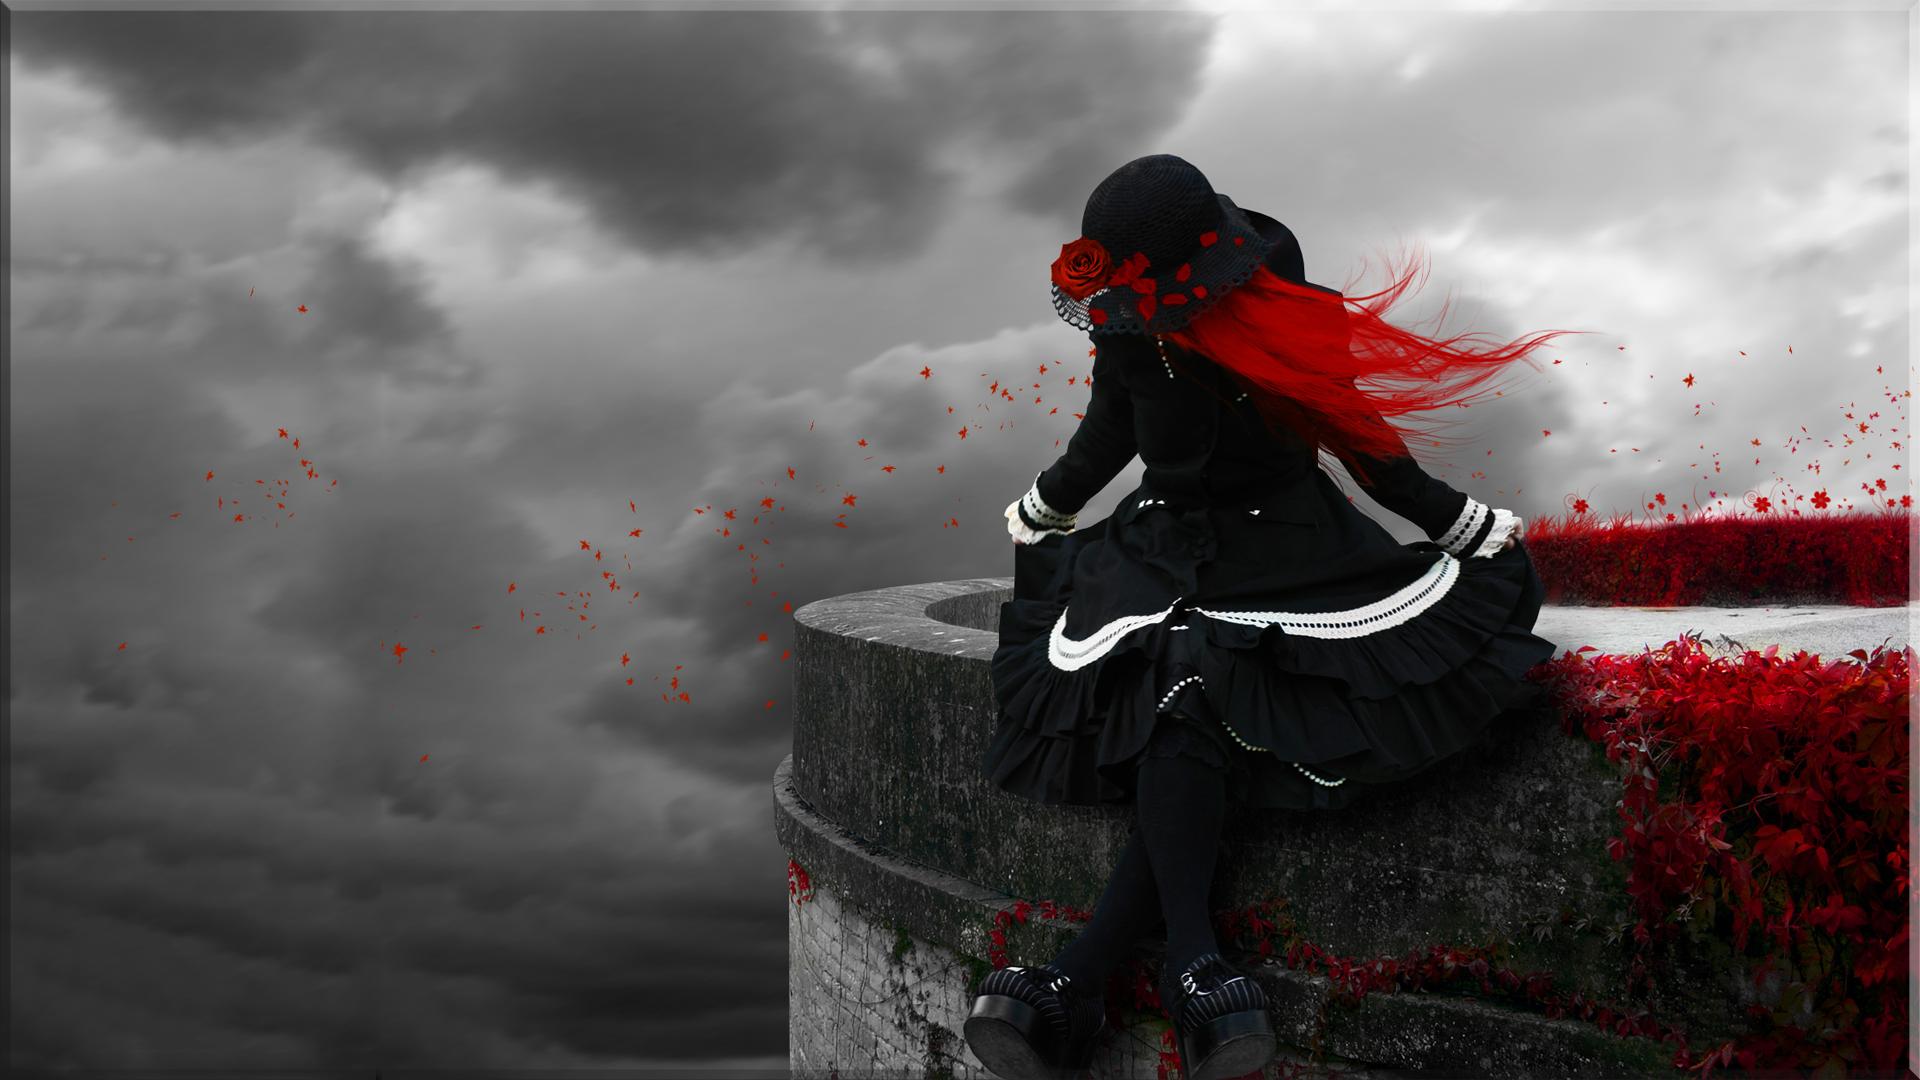 Gothic Redhead HD Wallpaper